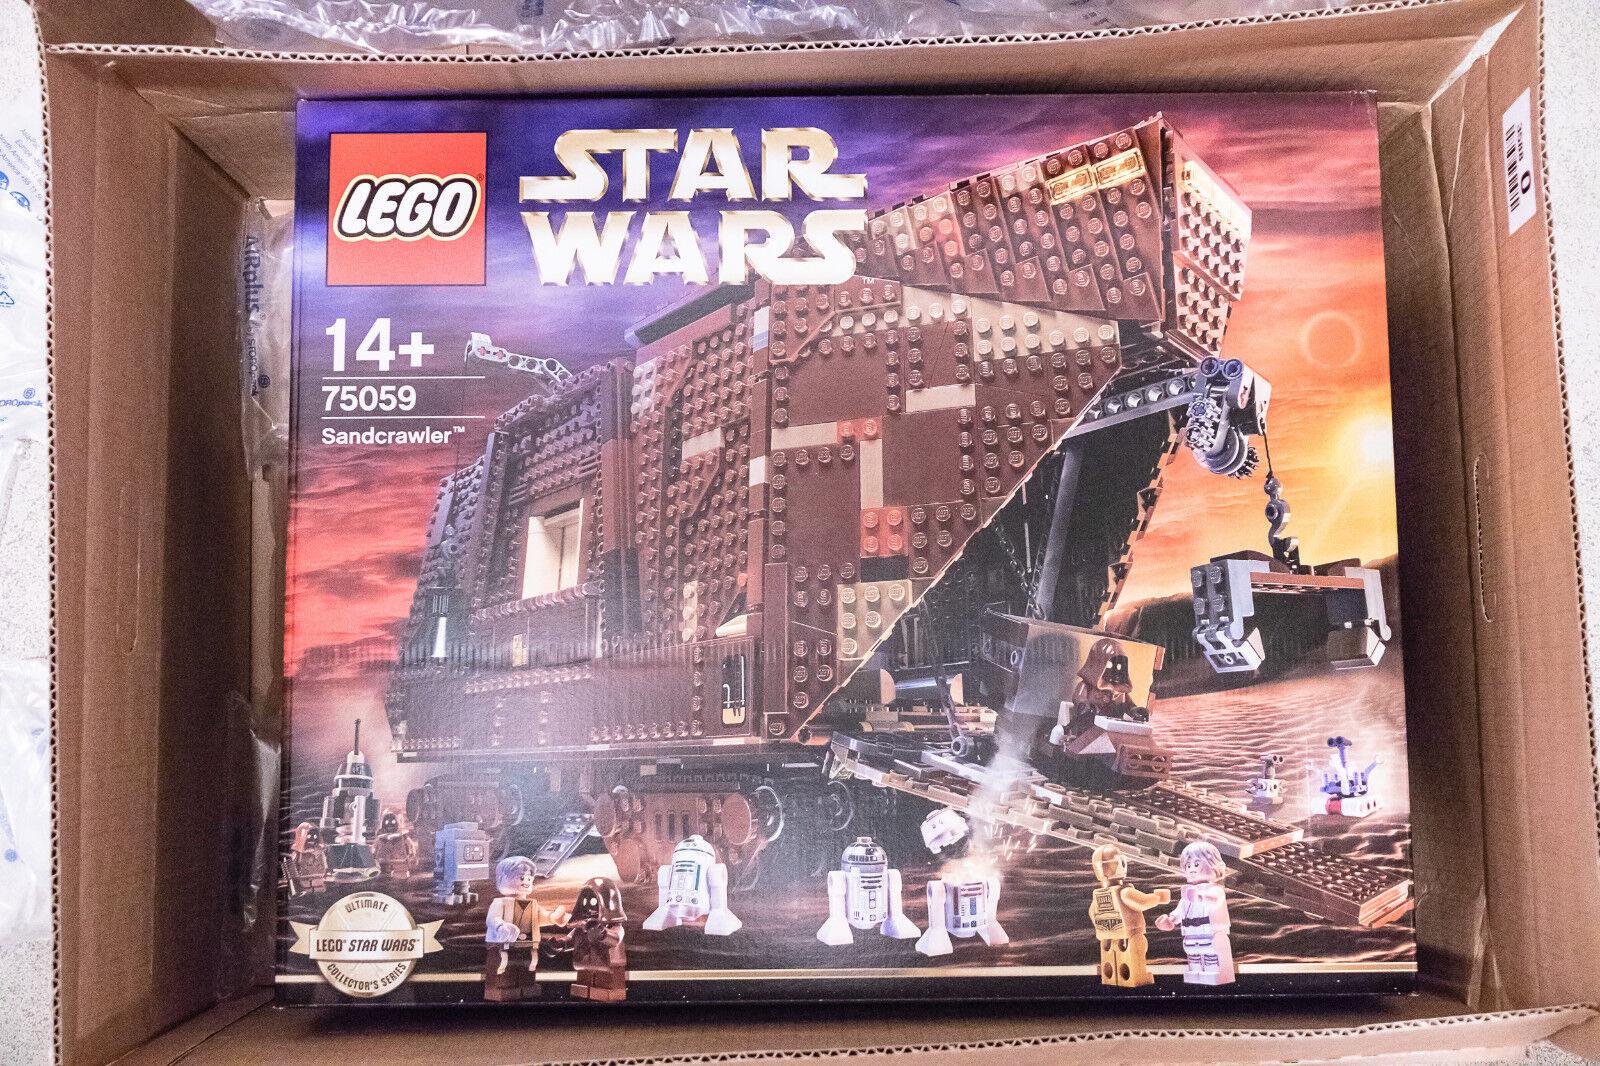 LEGO ® estrella guerras ™ UCS 75059  Secrawler ™ NUOVO OVP nuovo MISB NRFB  risposte rapide